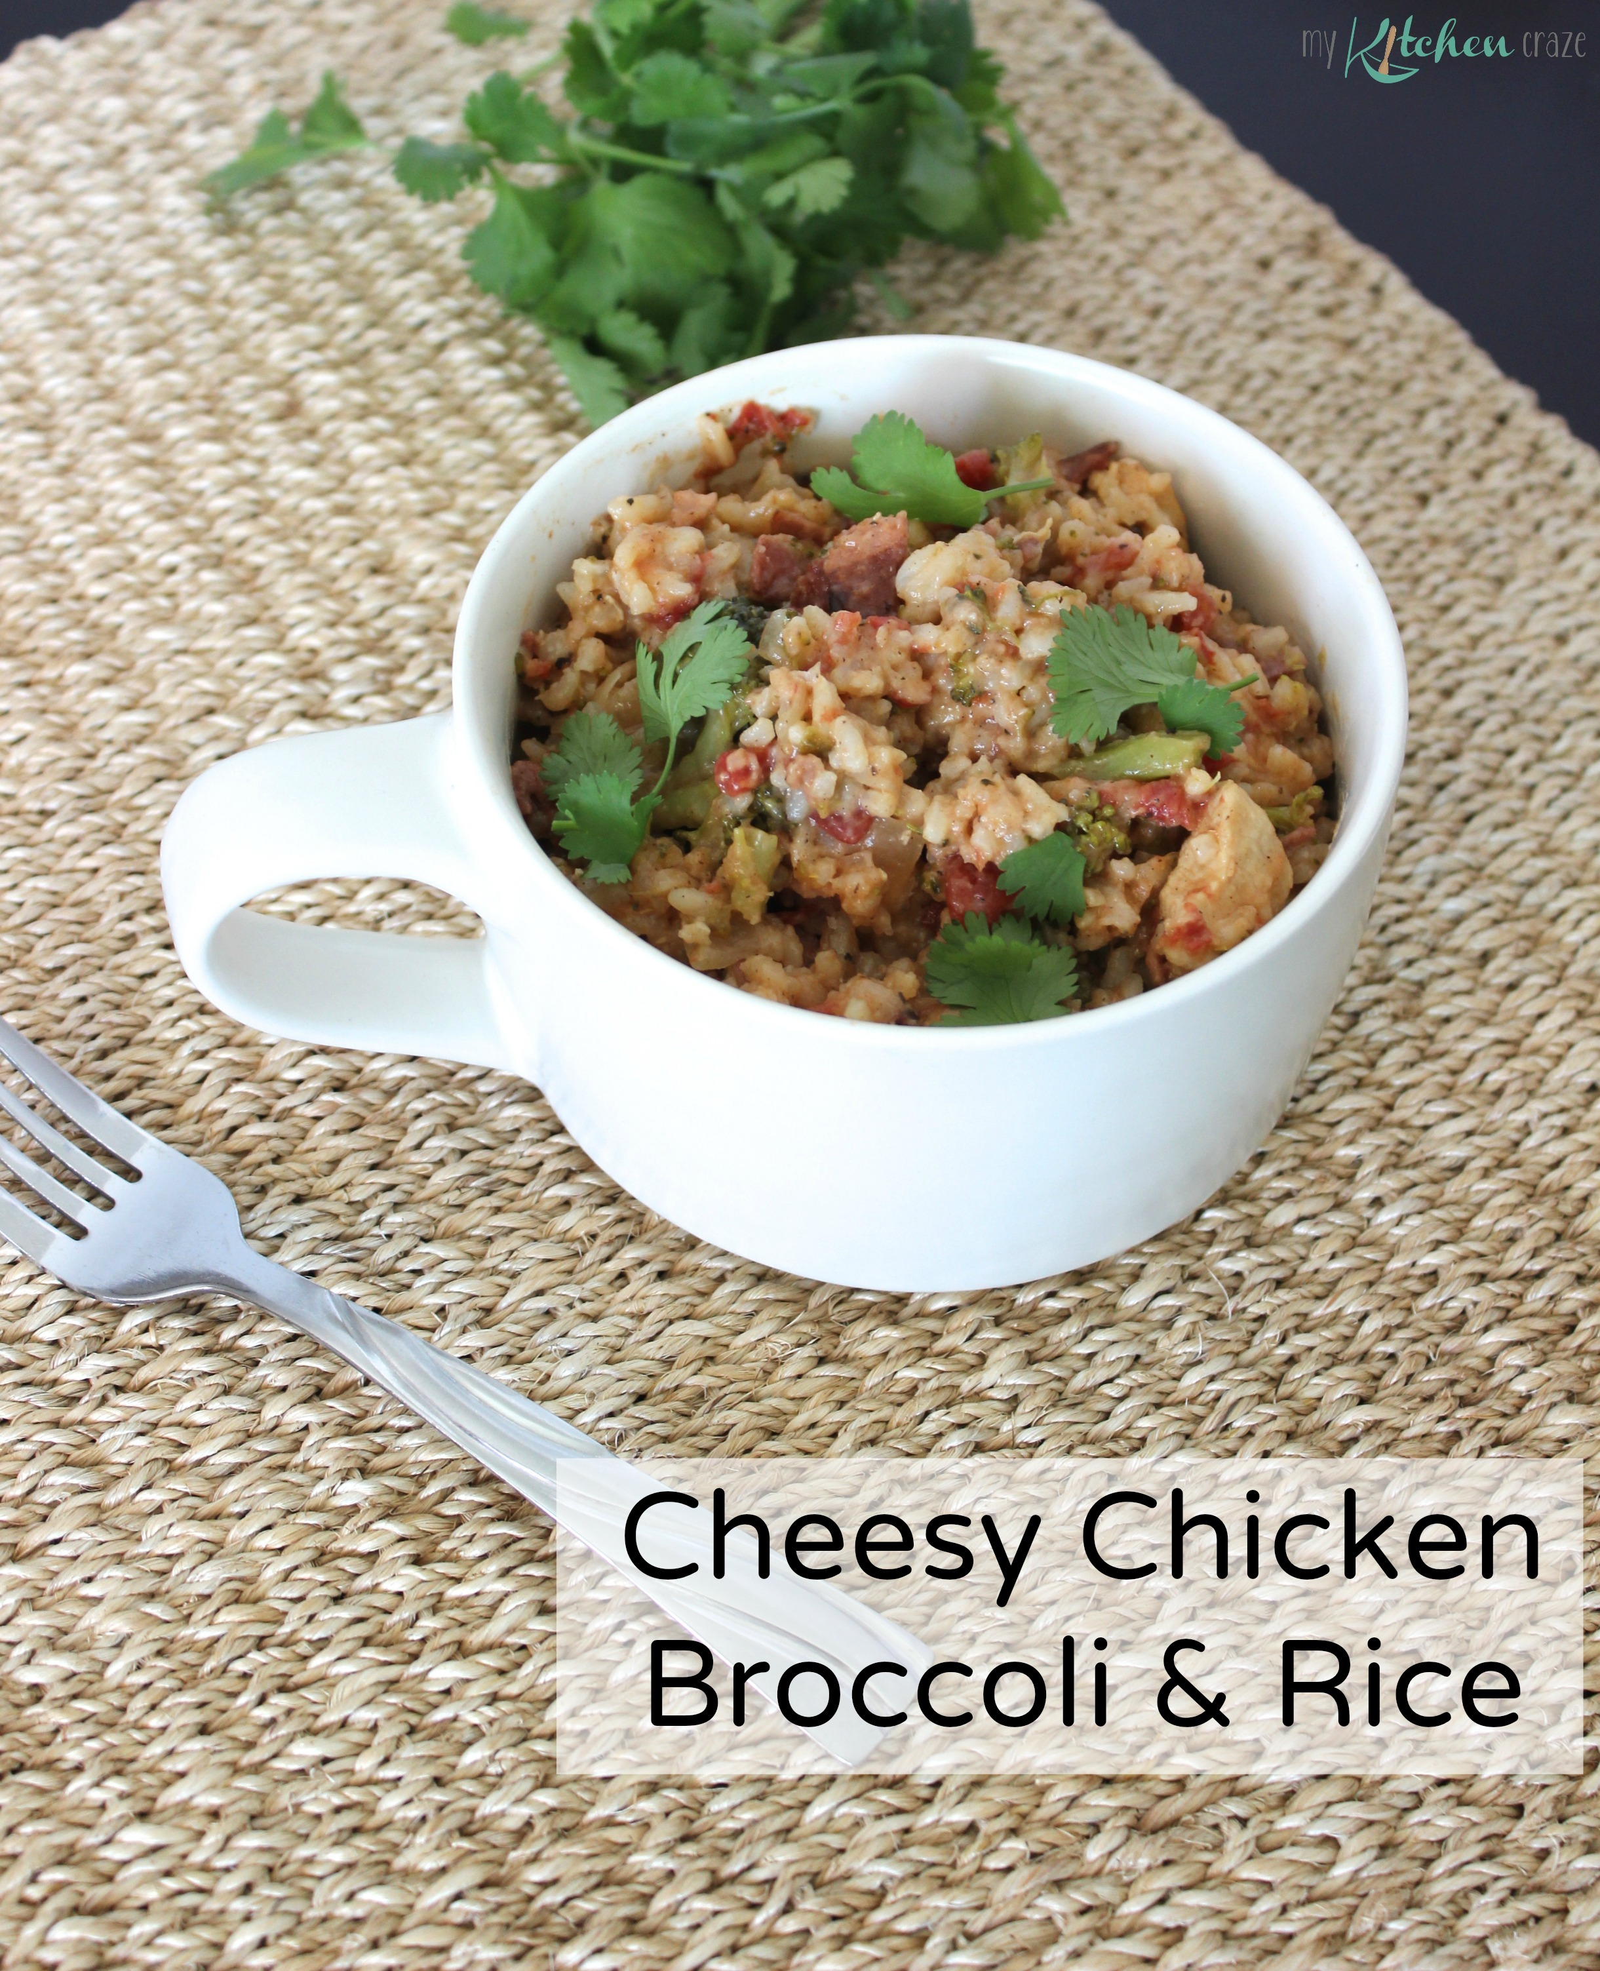 Cheesy Chicken Broccoli and Rice - My Kitchen Craze